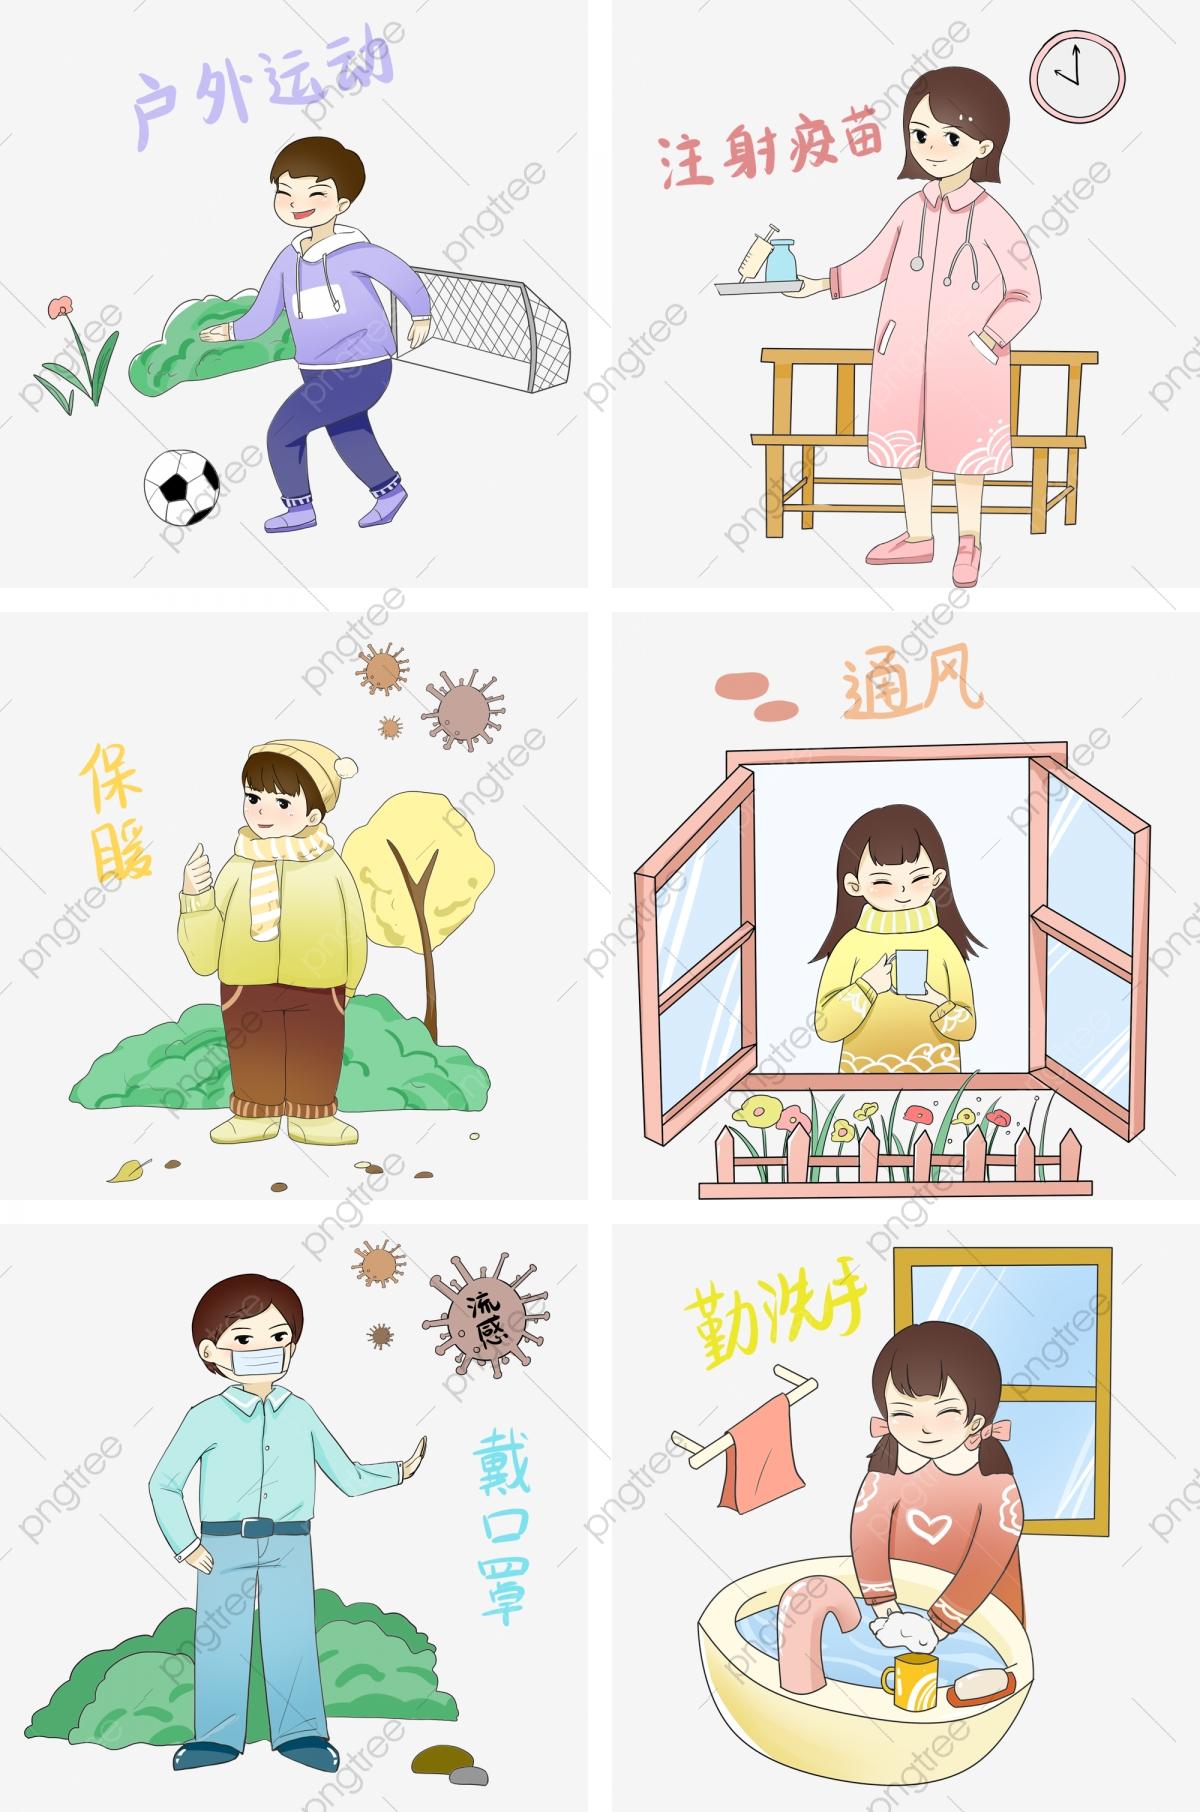 Flu clipart cartoon. Influenza winter anti virus